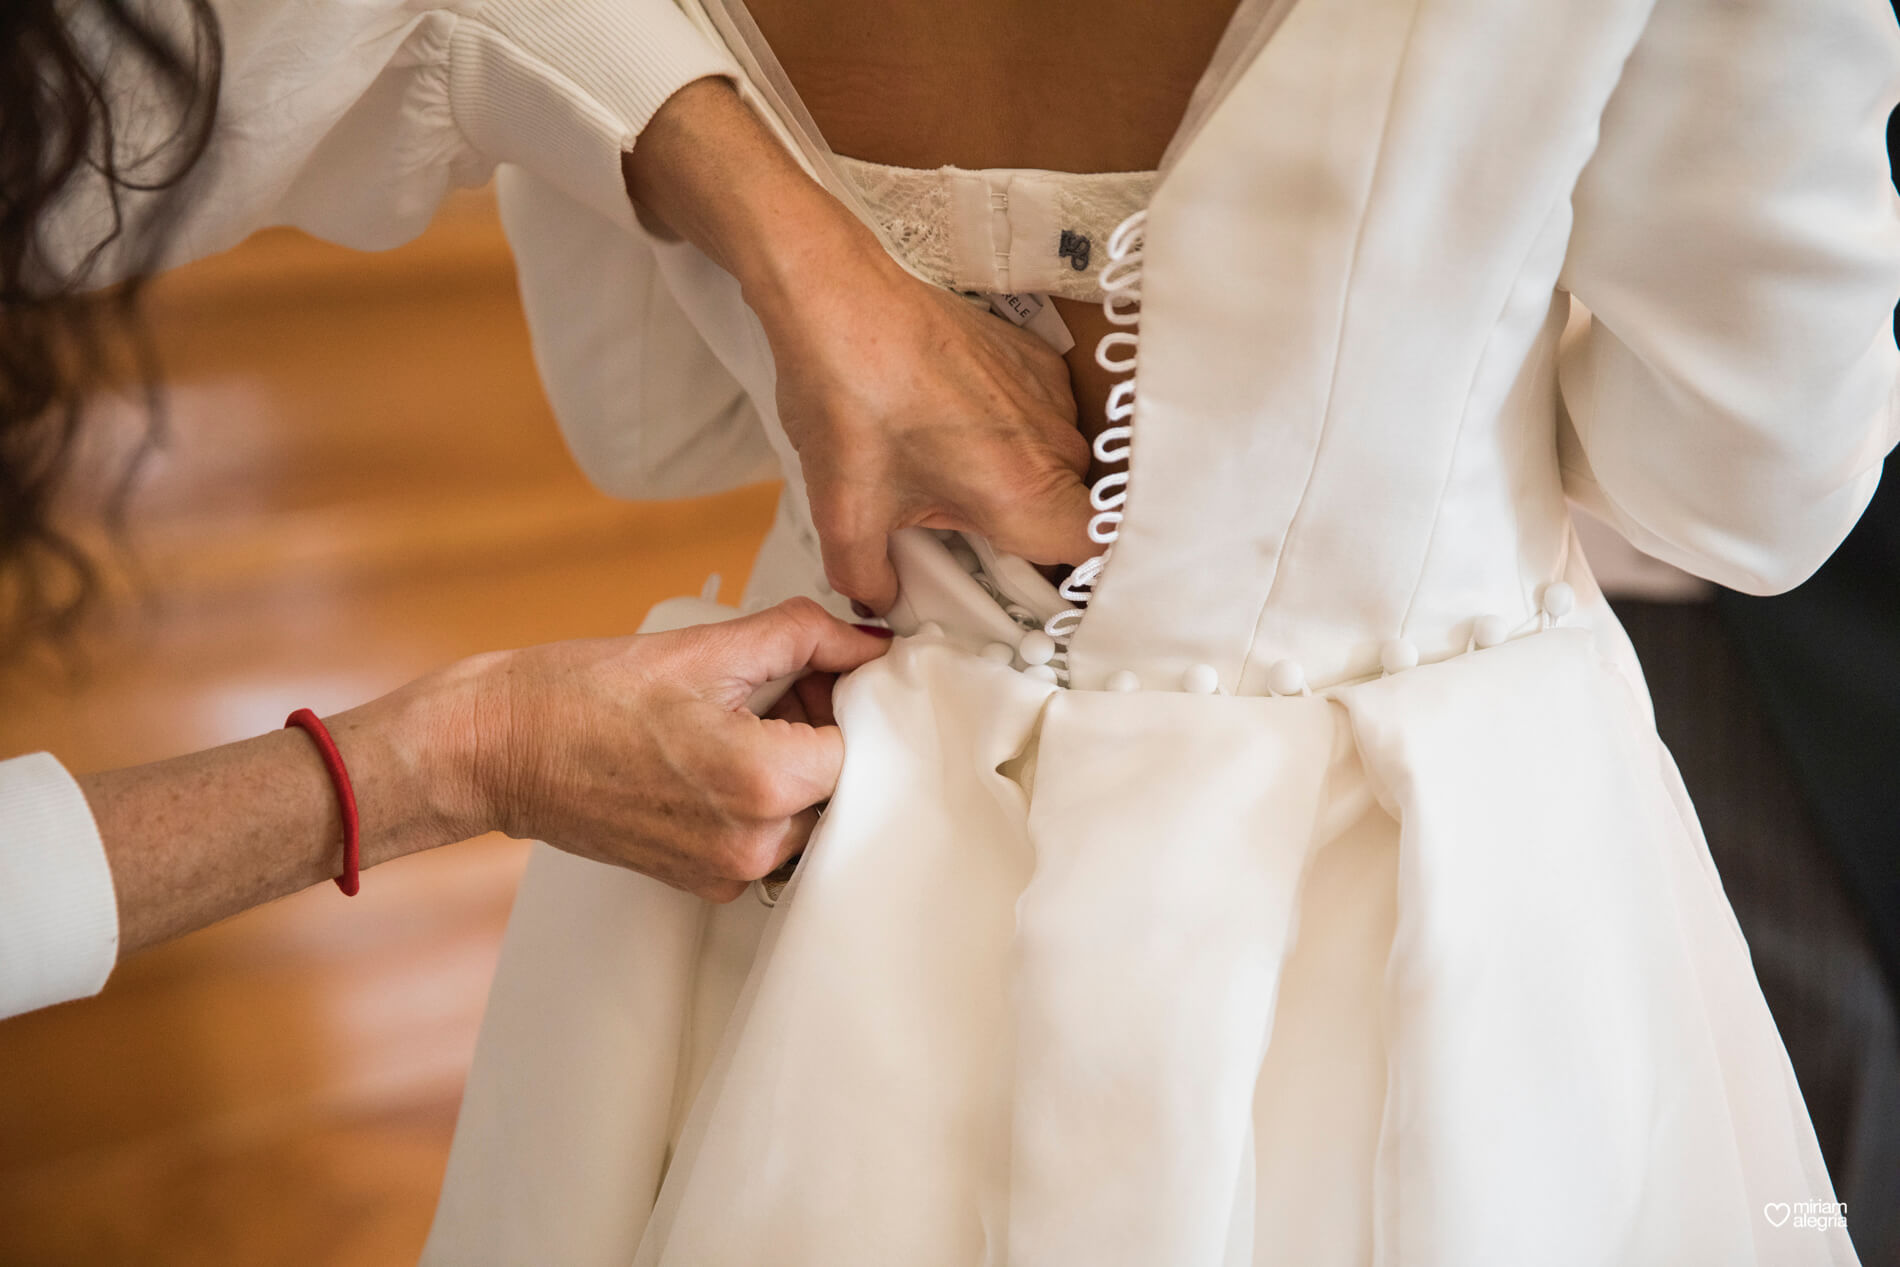 vestido-de-novia-paula-del-vas-miriam-alegria-fotografos-boda-murcia-31